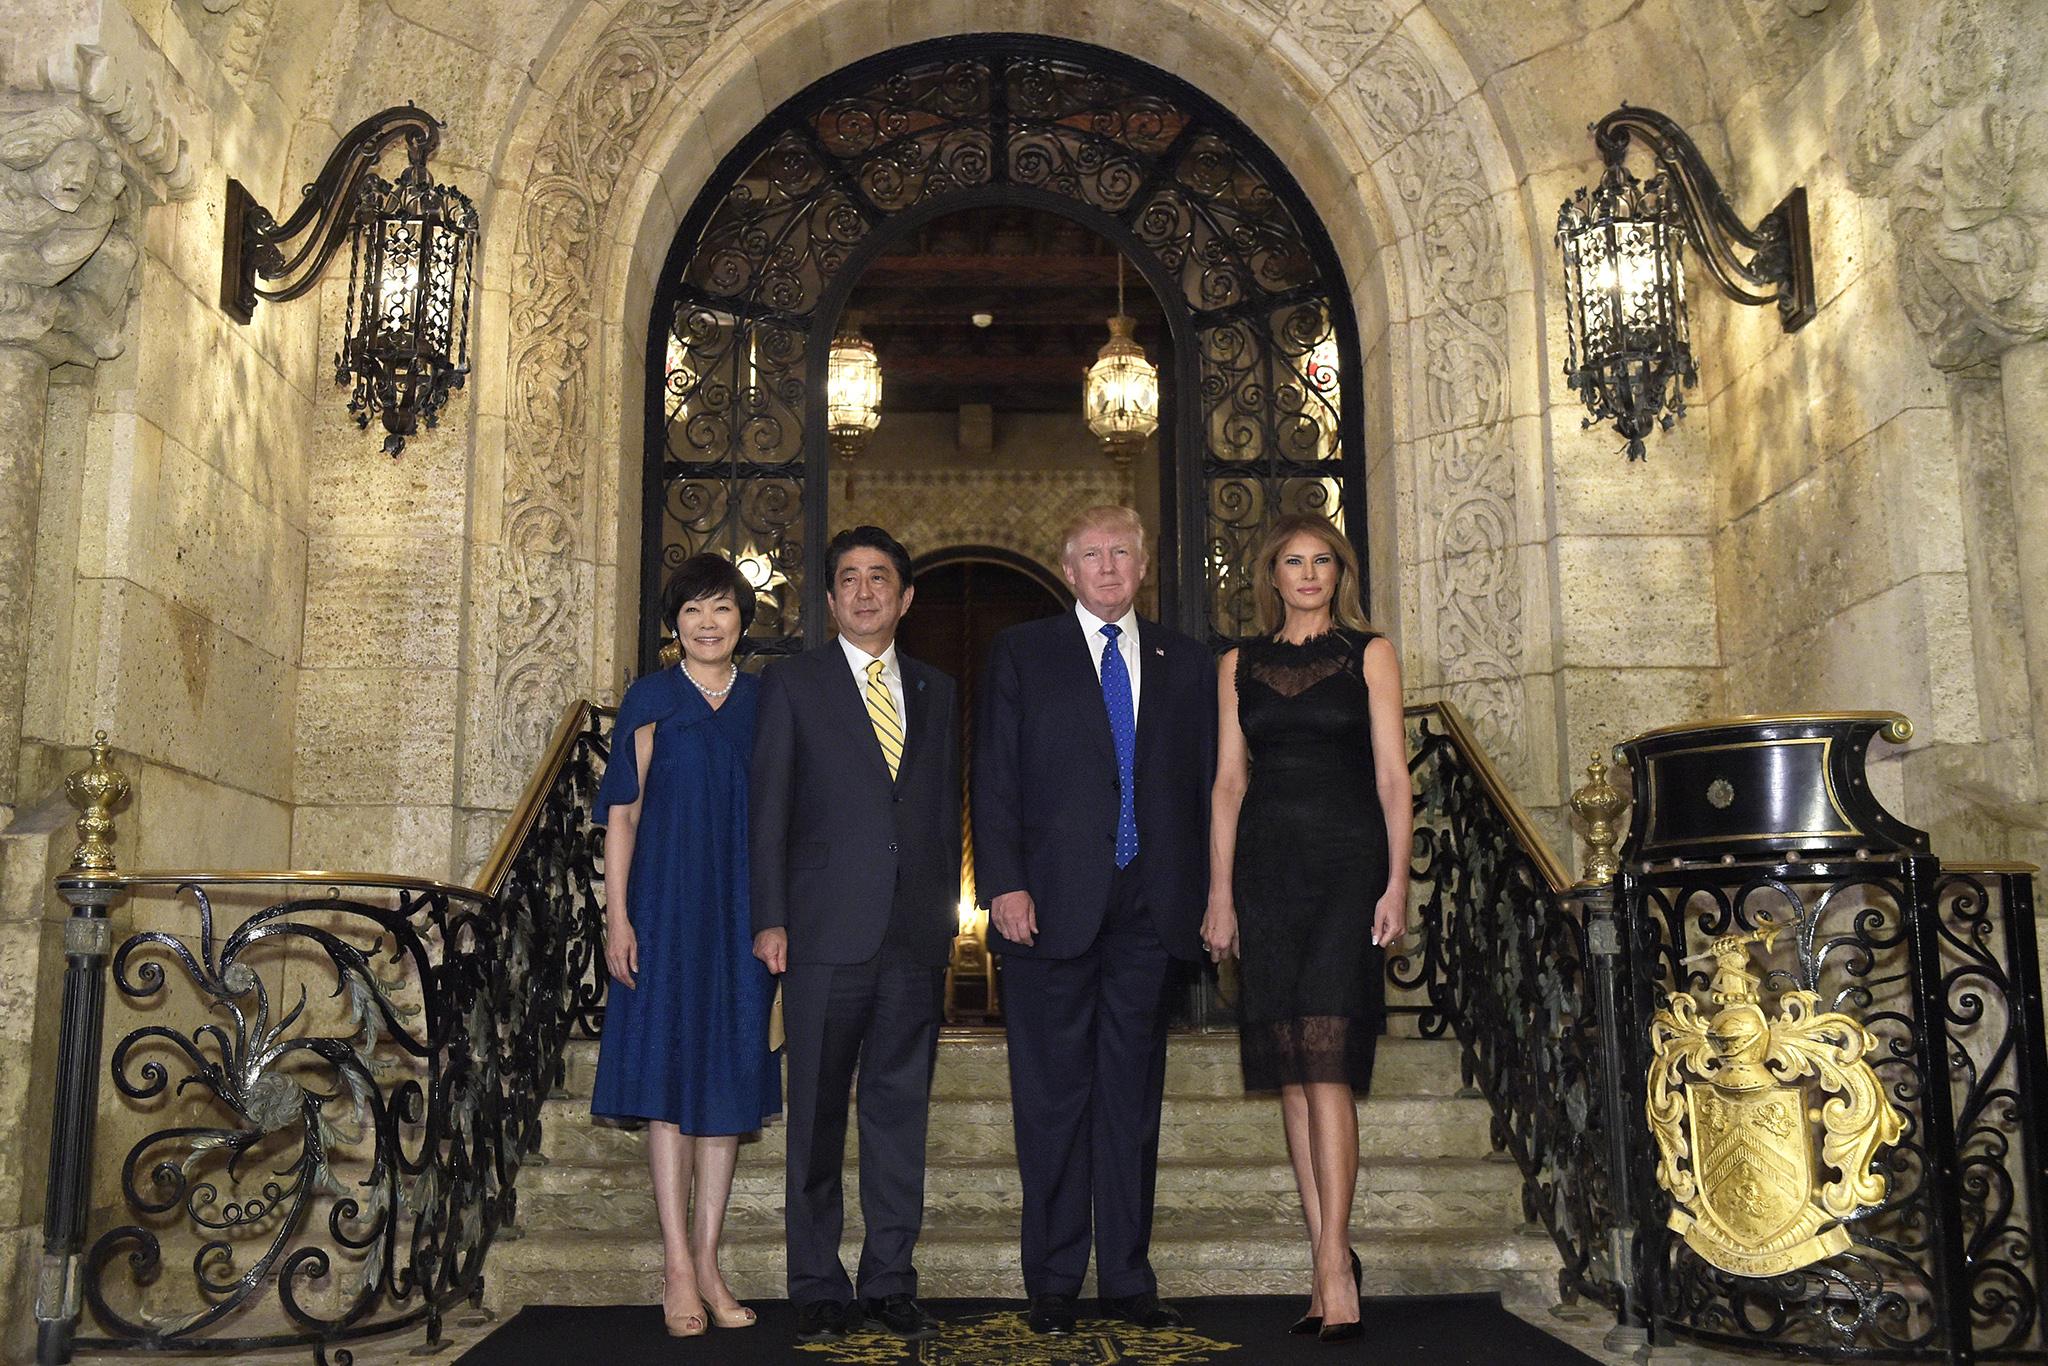 Donald Trump, Melania Trump, Shinzo Abe, and Akie Abe